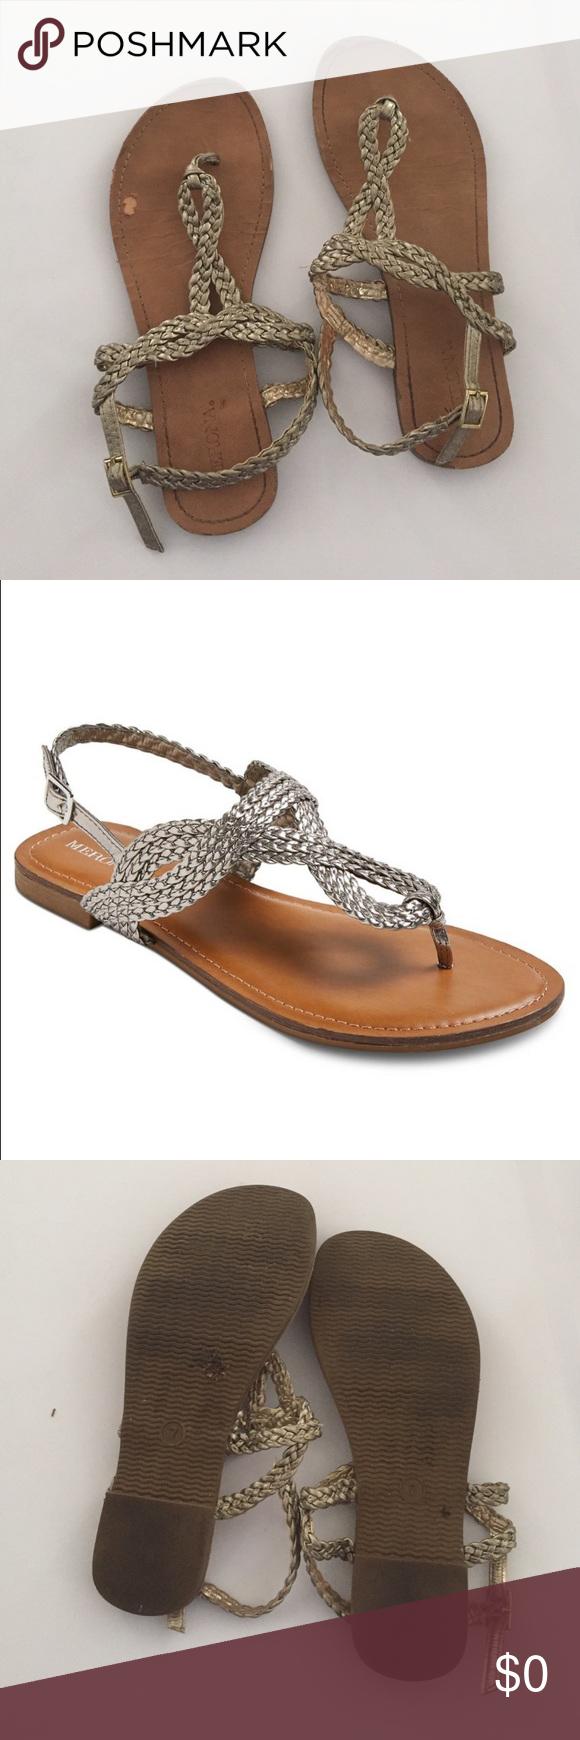 c4e5d9932e39e0 Merona Silver Braided Sandals Merona Sandals (also available in orange) Merona  Shoes Sandals